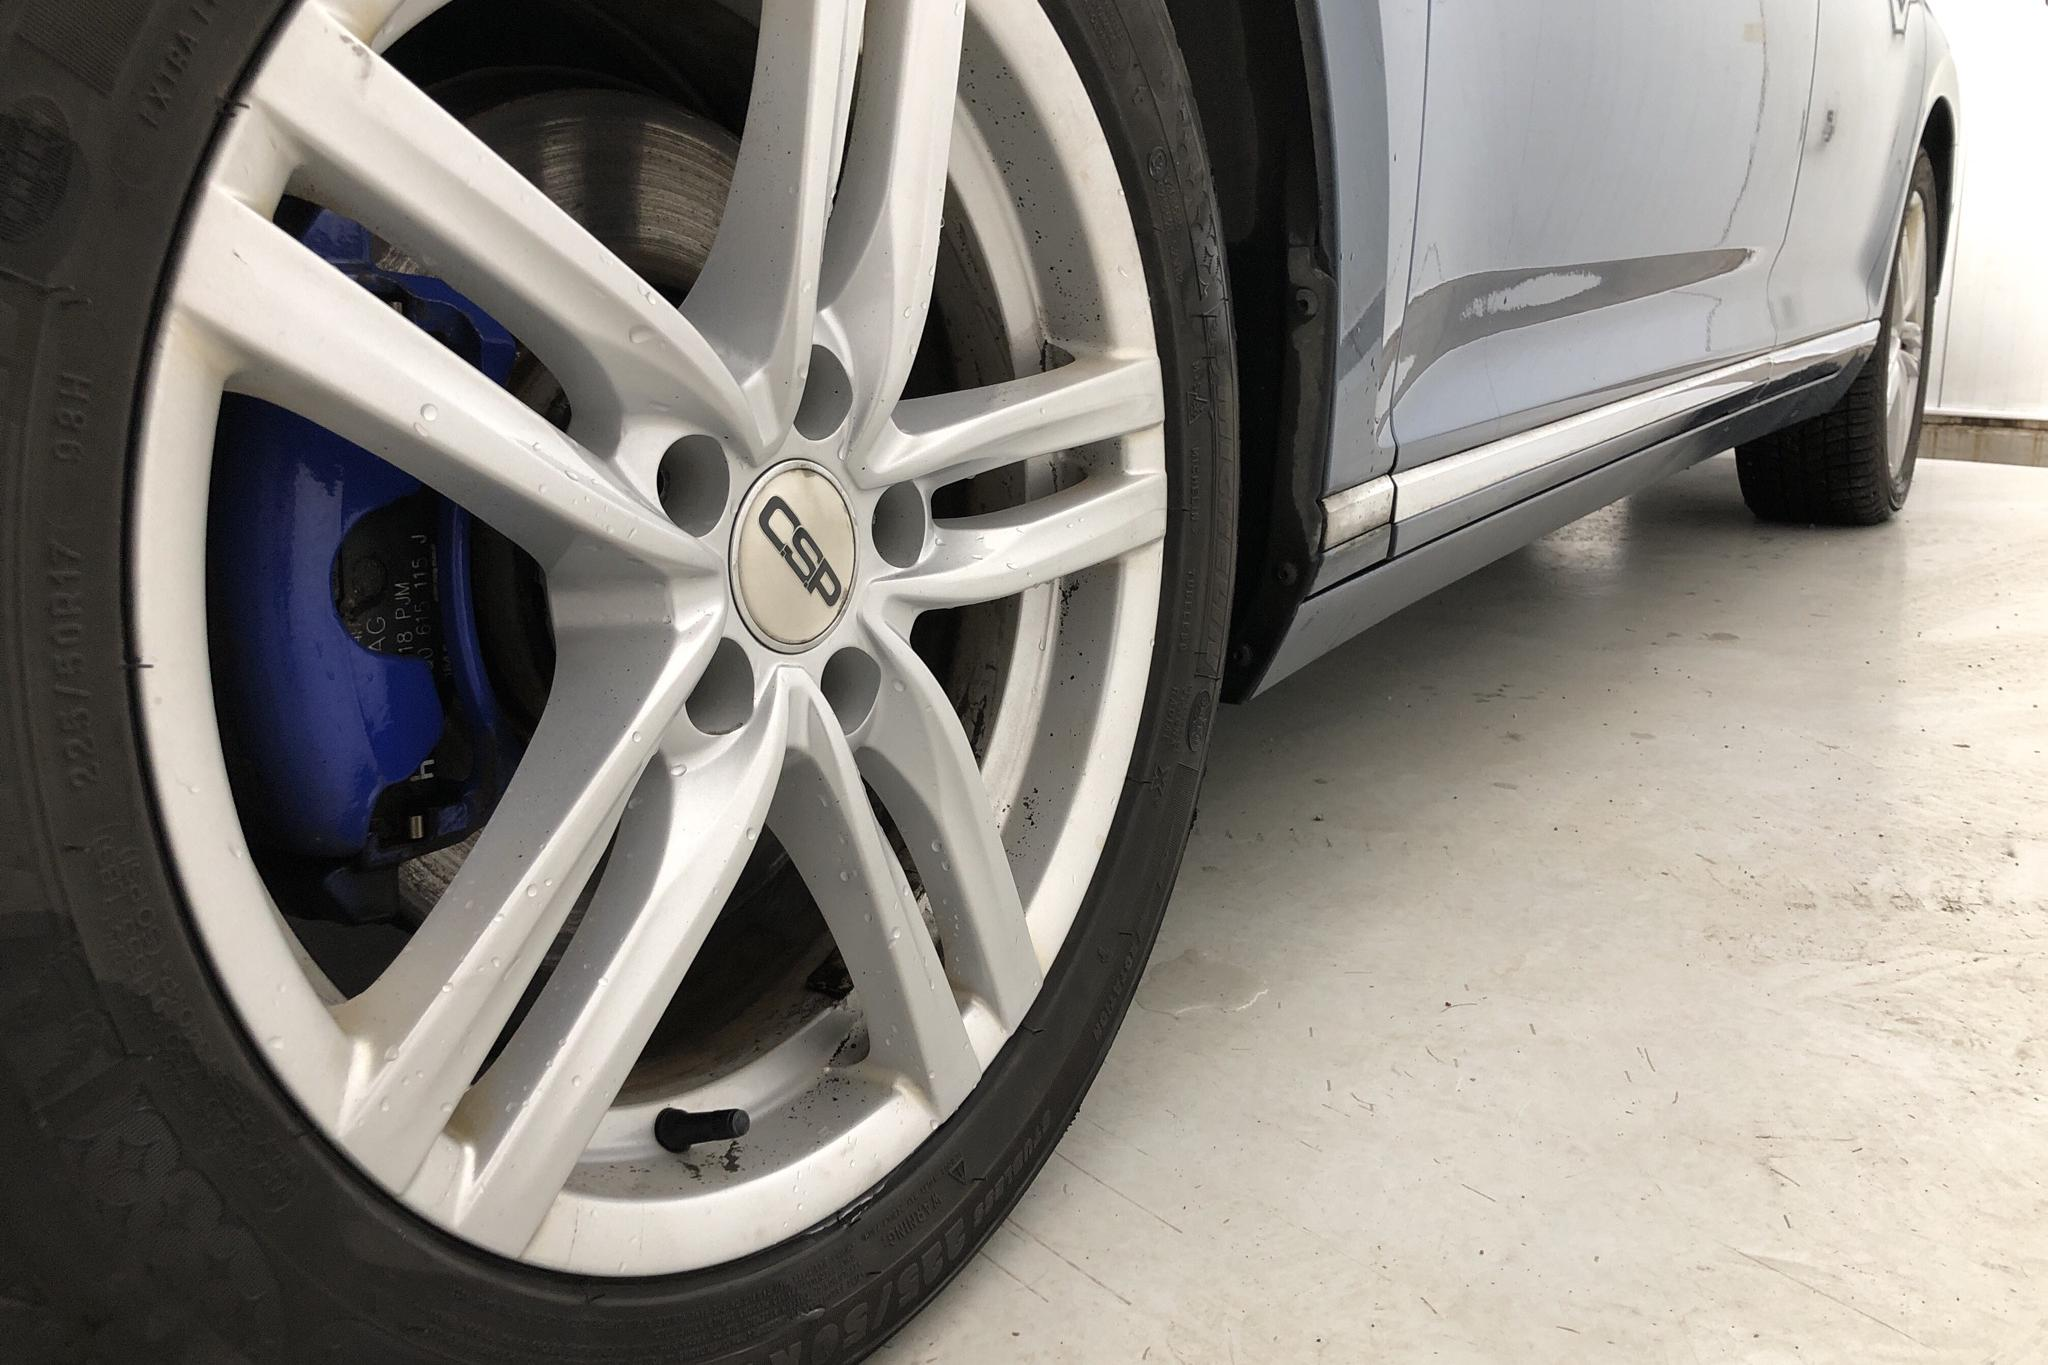 VW Passat 1.4 Plug-in-Hybrid Sportscombi (218hk) - 145 600 km - Automatic - blue - 2017